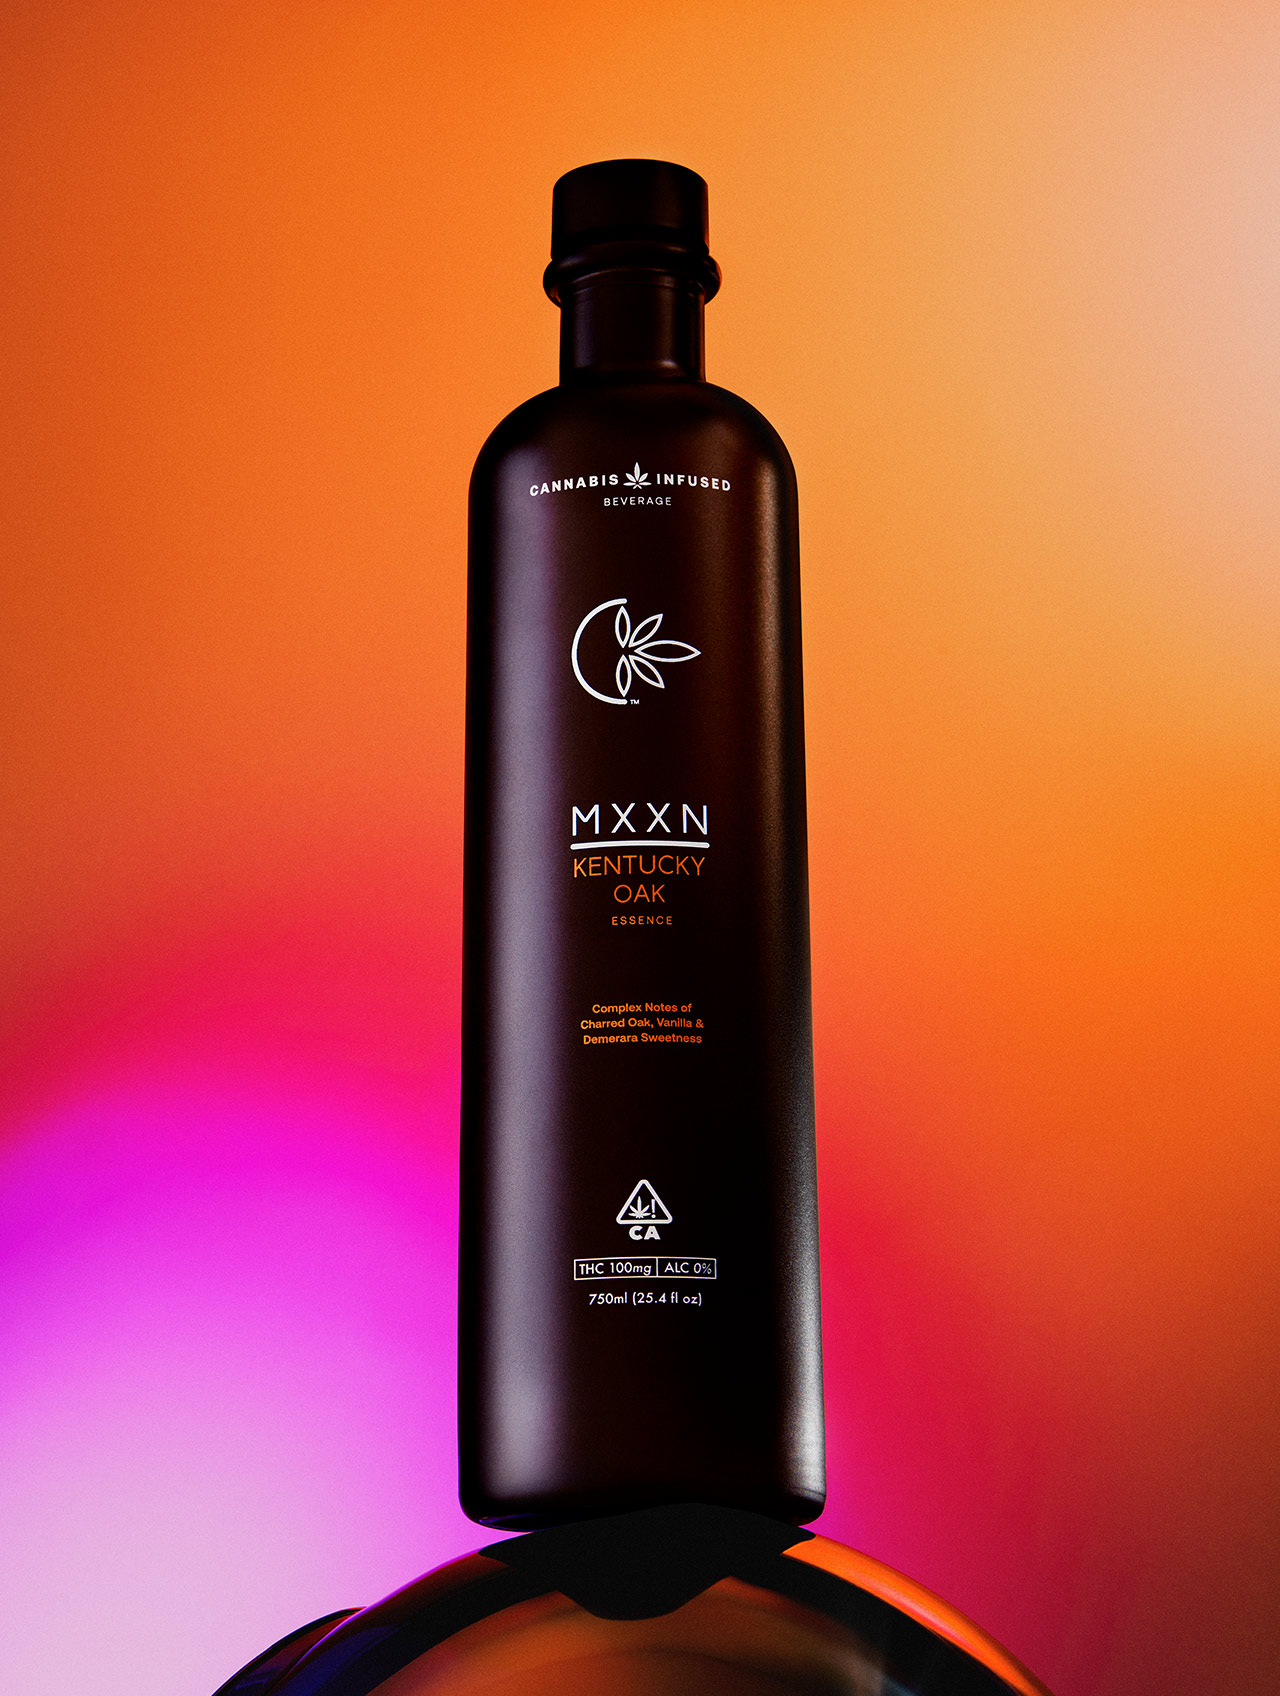 MXXN Kentucky Oak: THC-Infused, Alcohol-Free Spirit